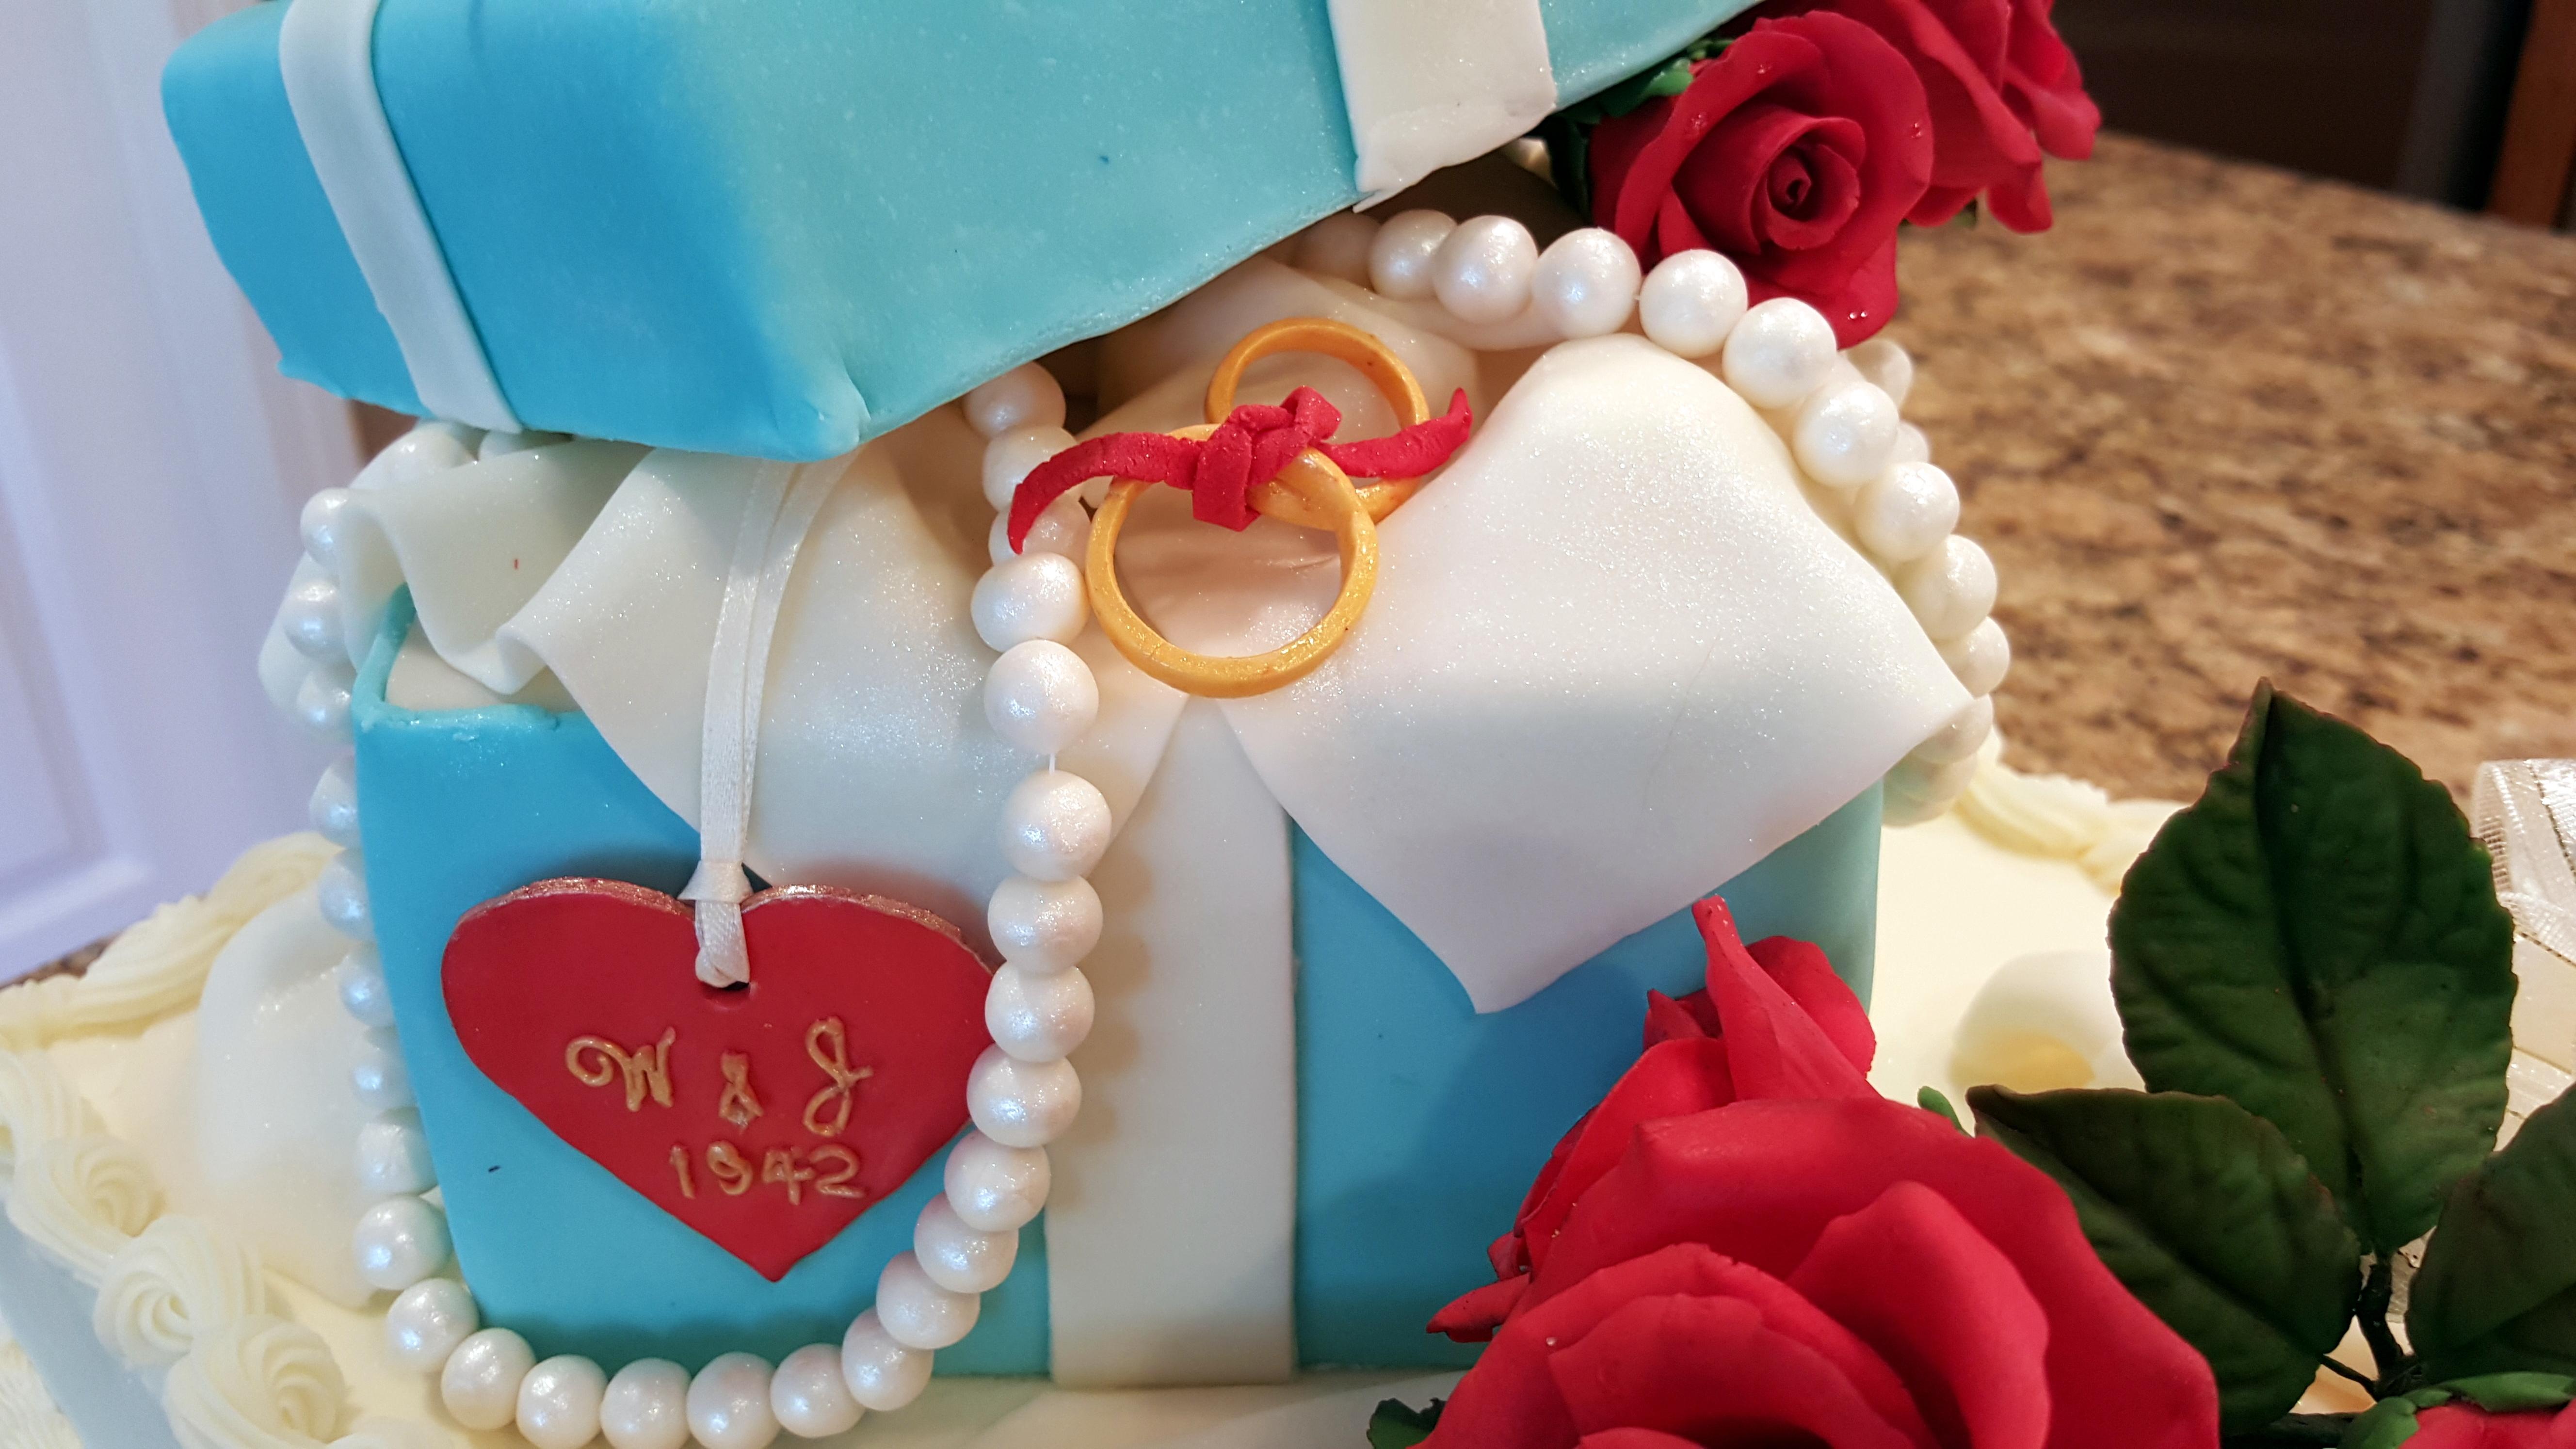 Cake Gift Box Fondant : Gift Box Cake - CakeCentral.com